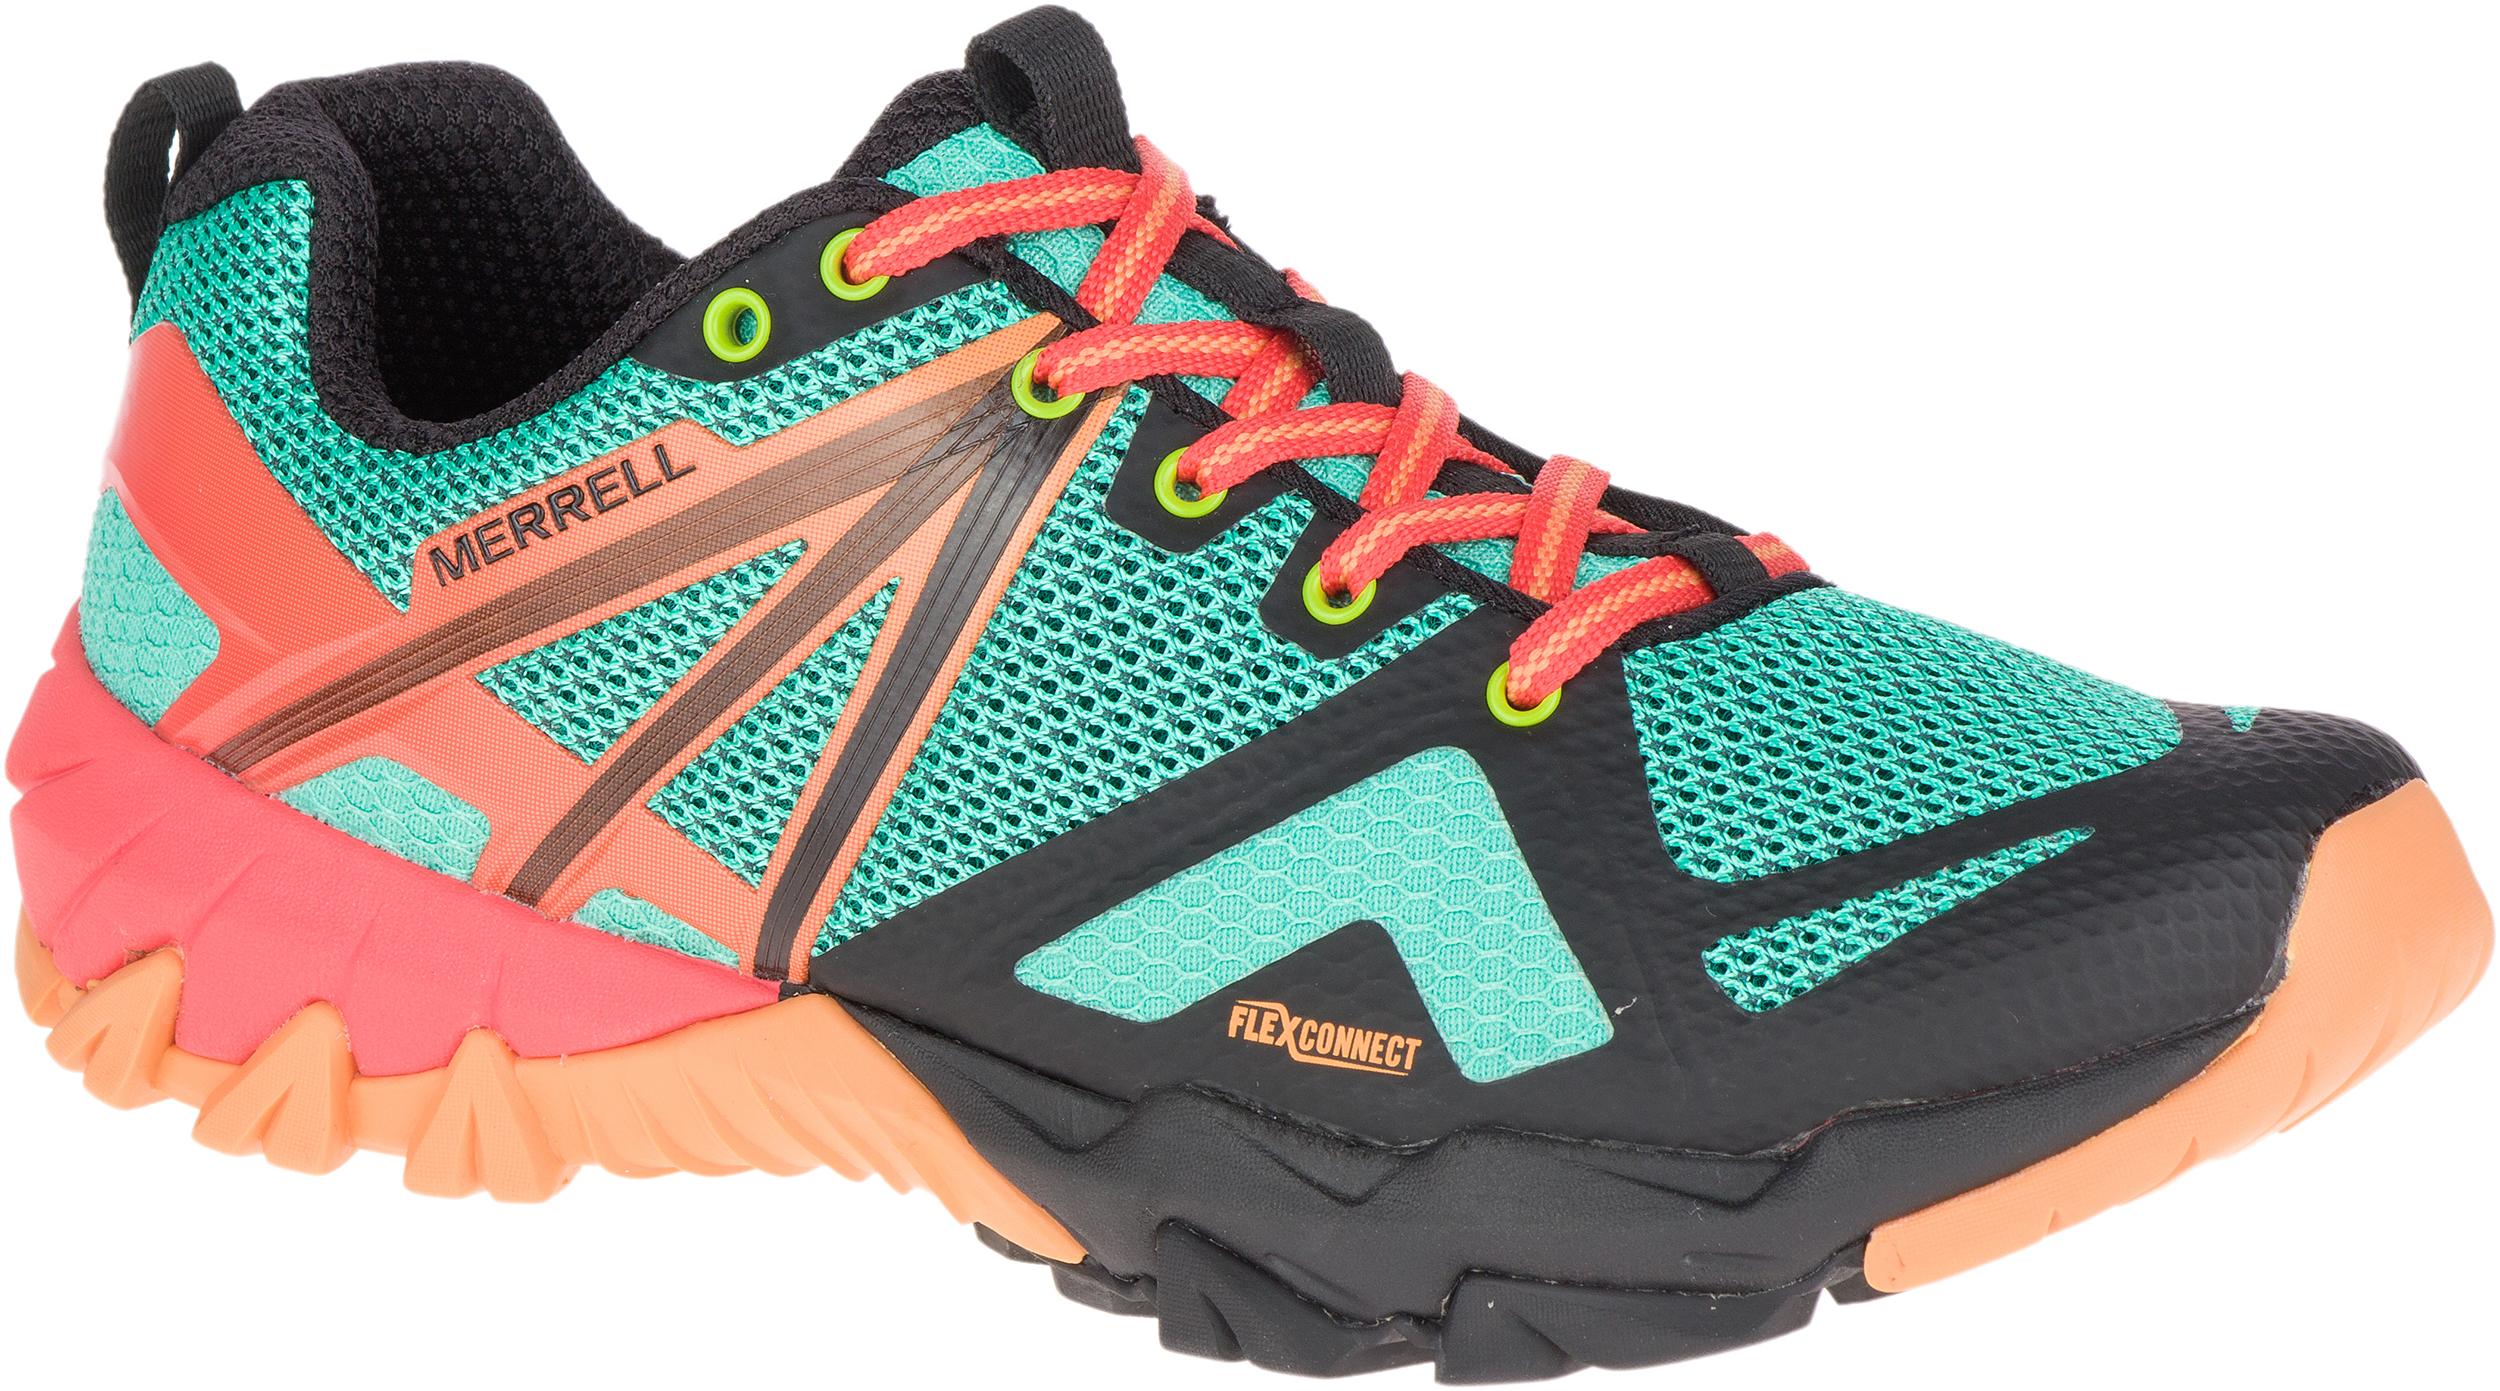 Merrell MQM Flex Vent Light Trail Shoes